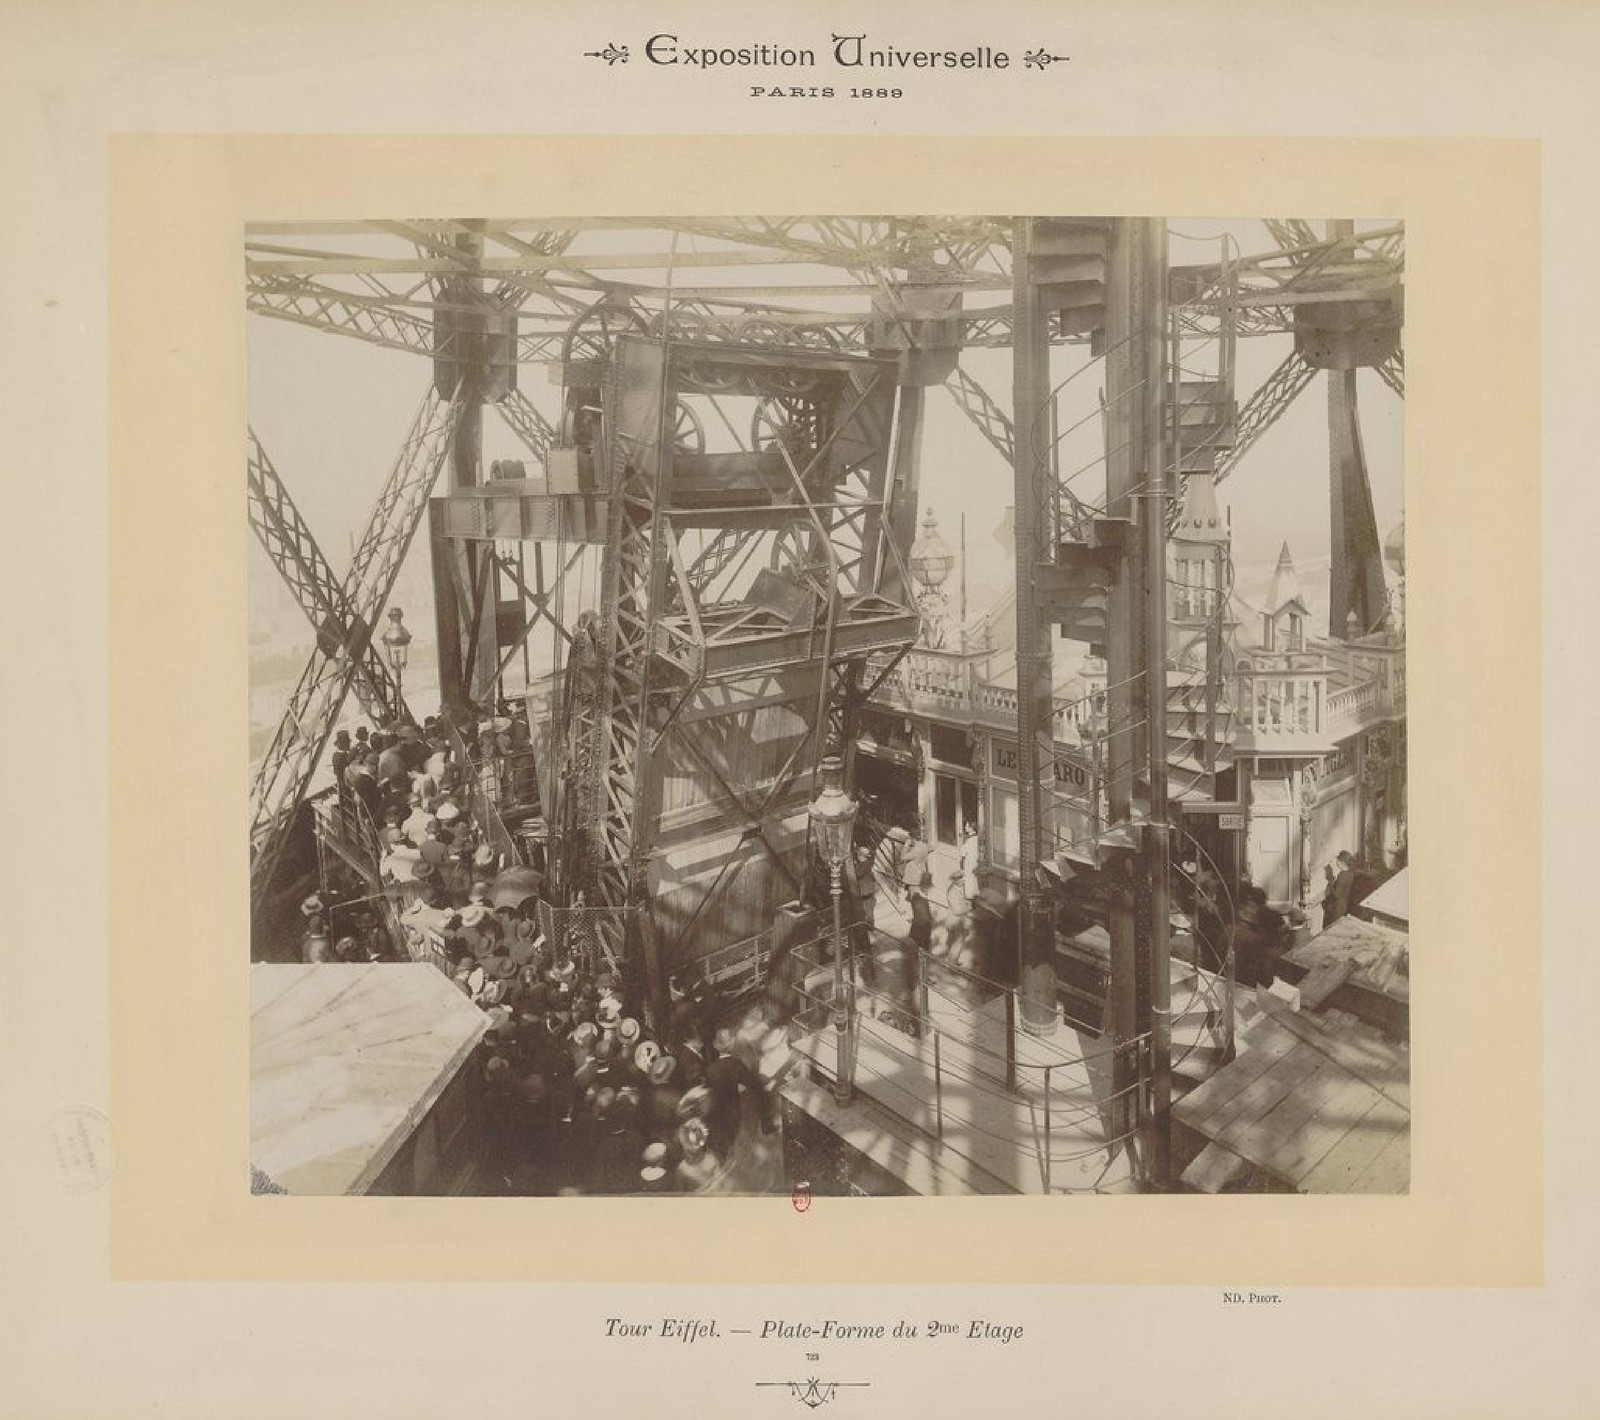 08. 1889. Эйфелева башня. Платформа 2 этажа